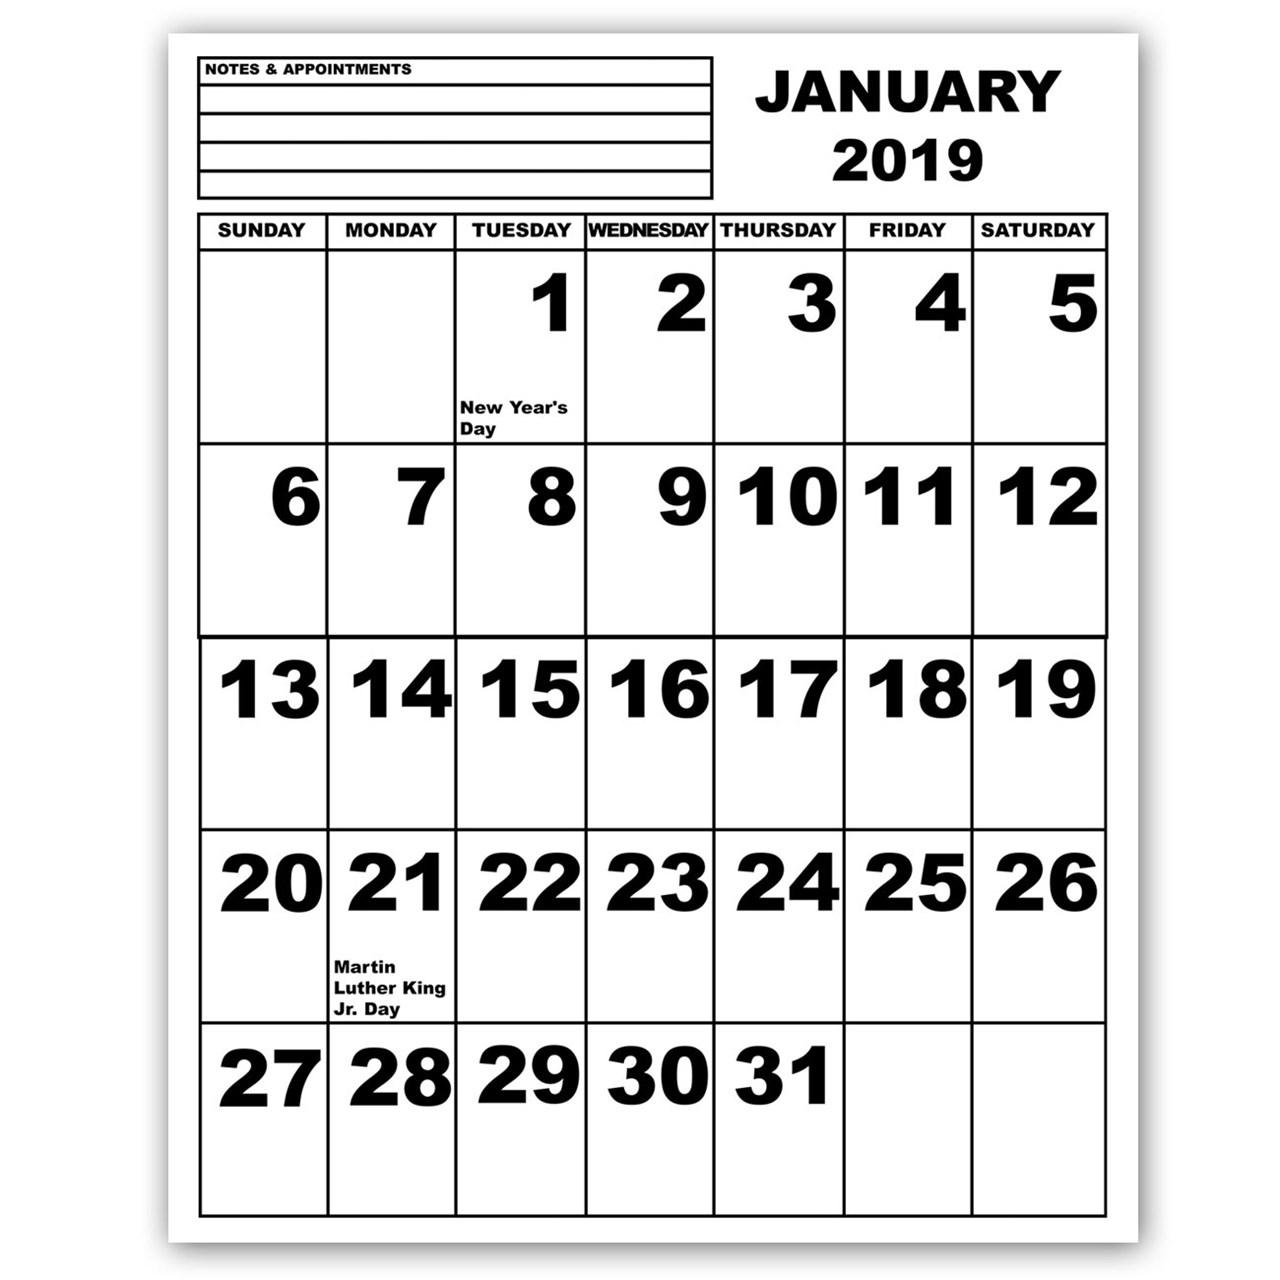 Free Calendar Templates For The Blind - Calendar Inspiration